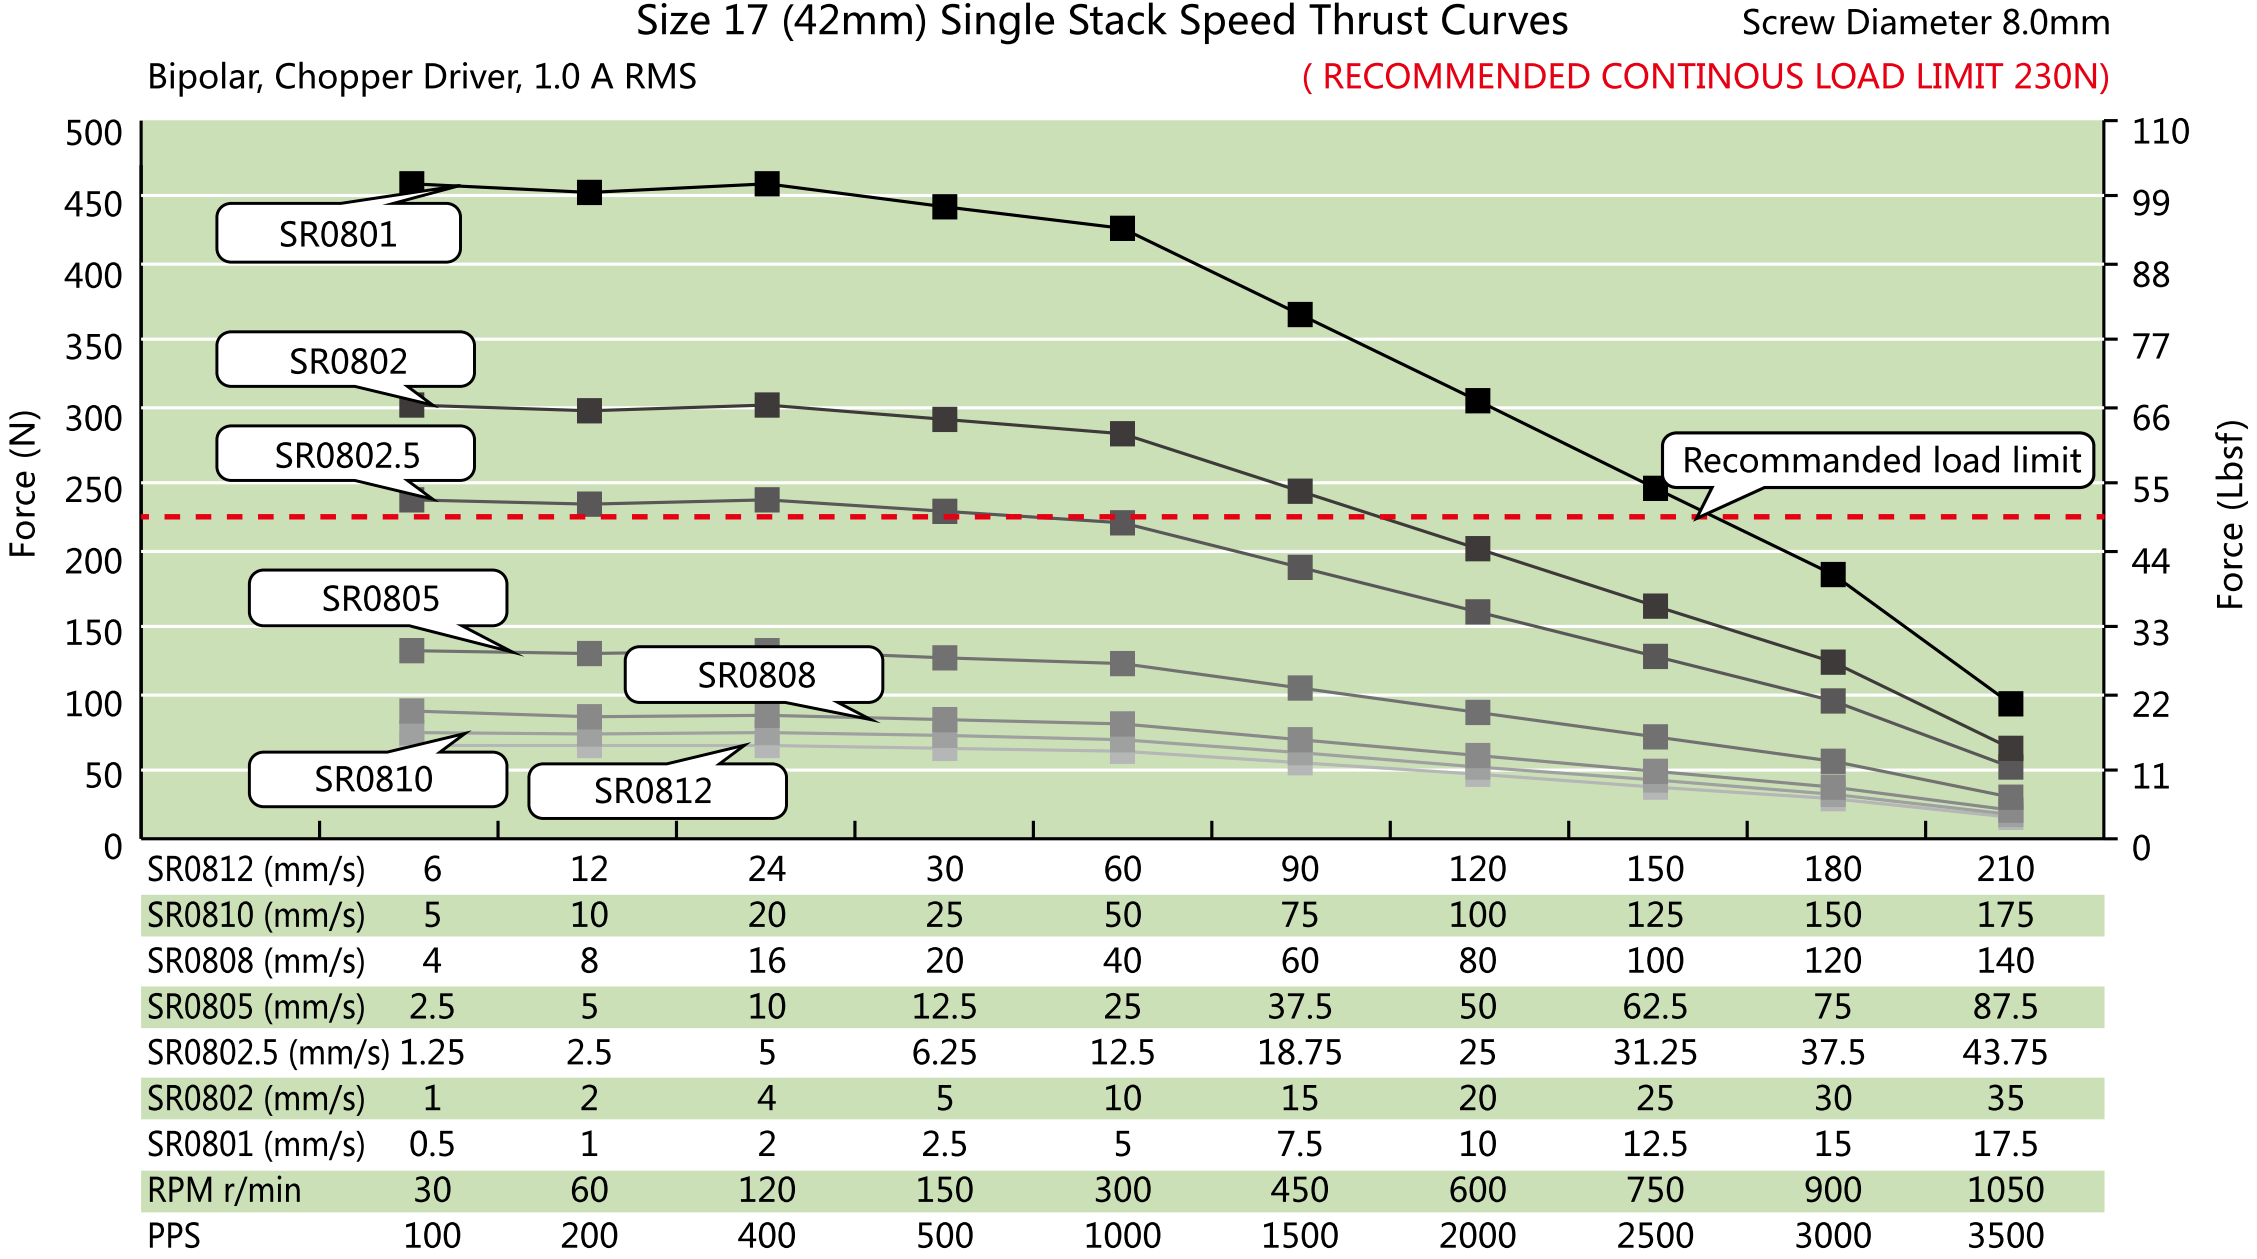 NEMA 17 Single Stack Ball Screw Actuator Speed Thrust Curve